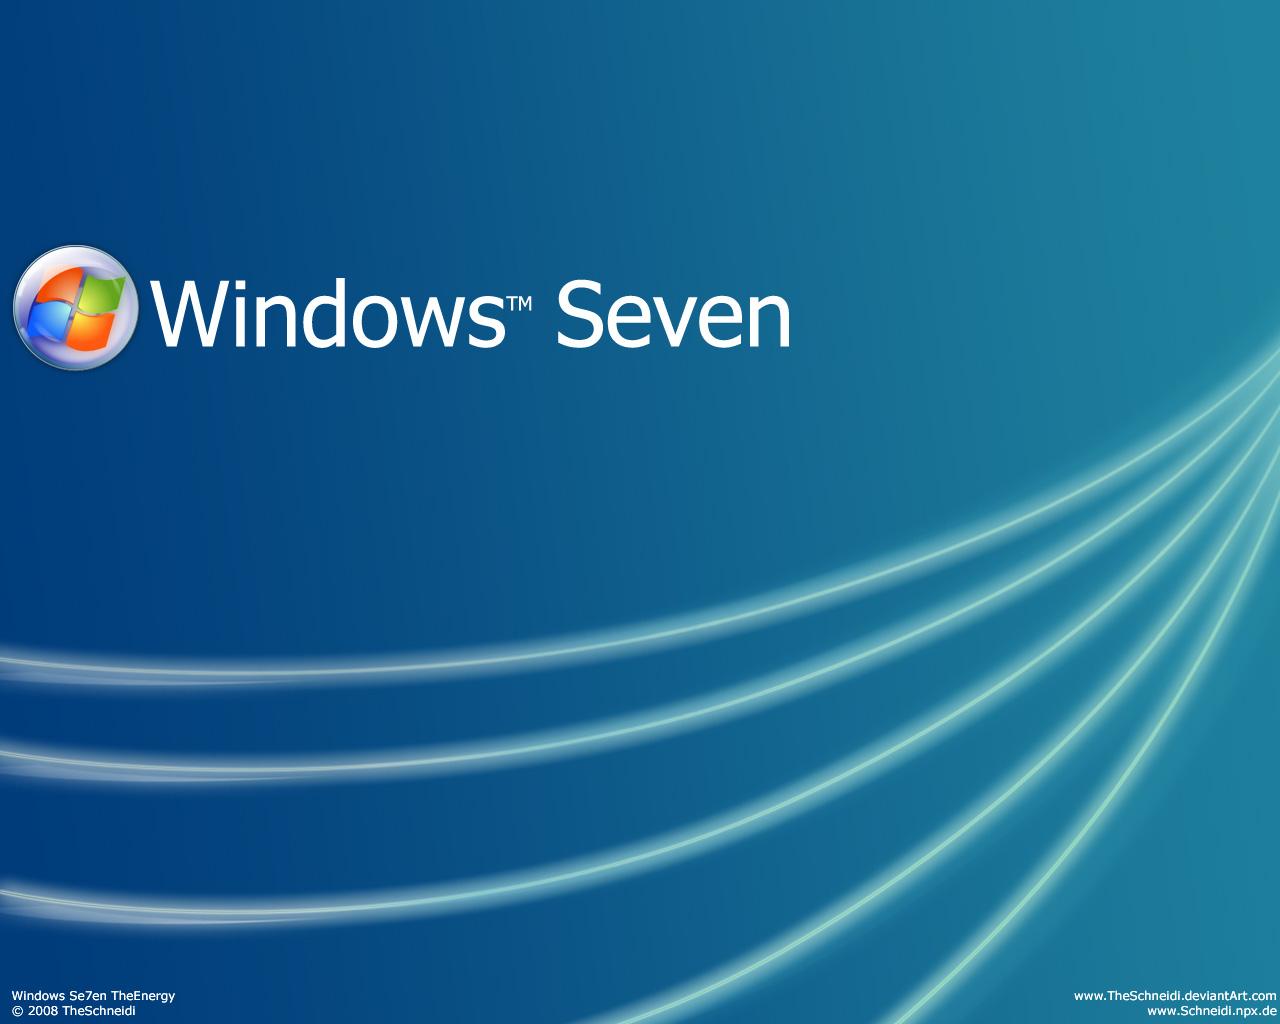 windows-seven-wallpaper-10